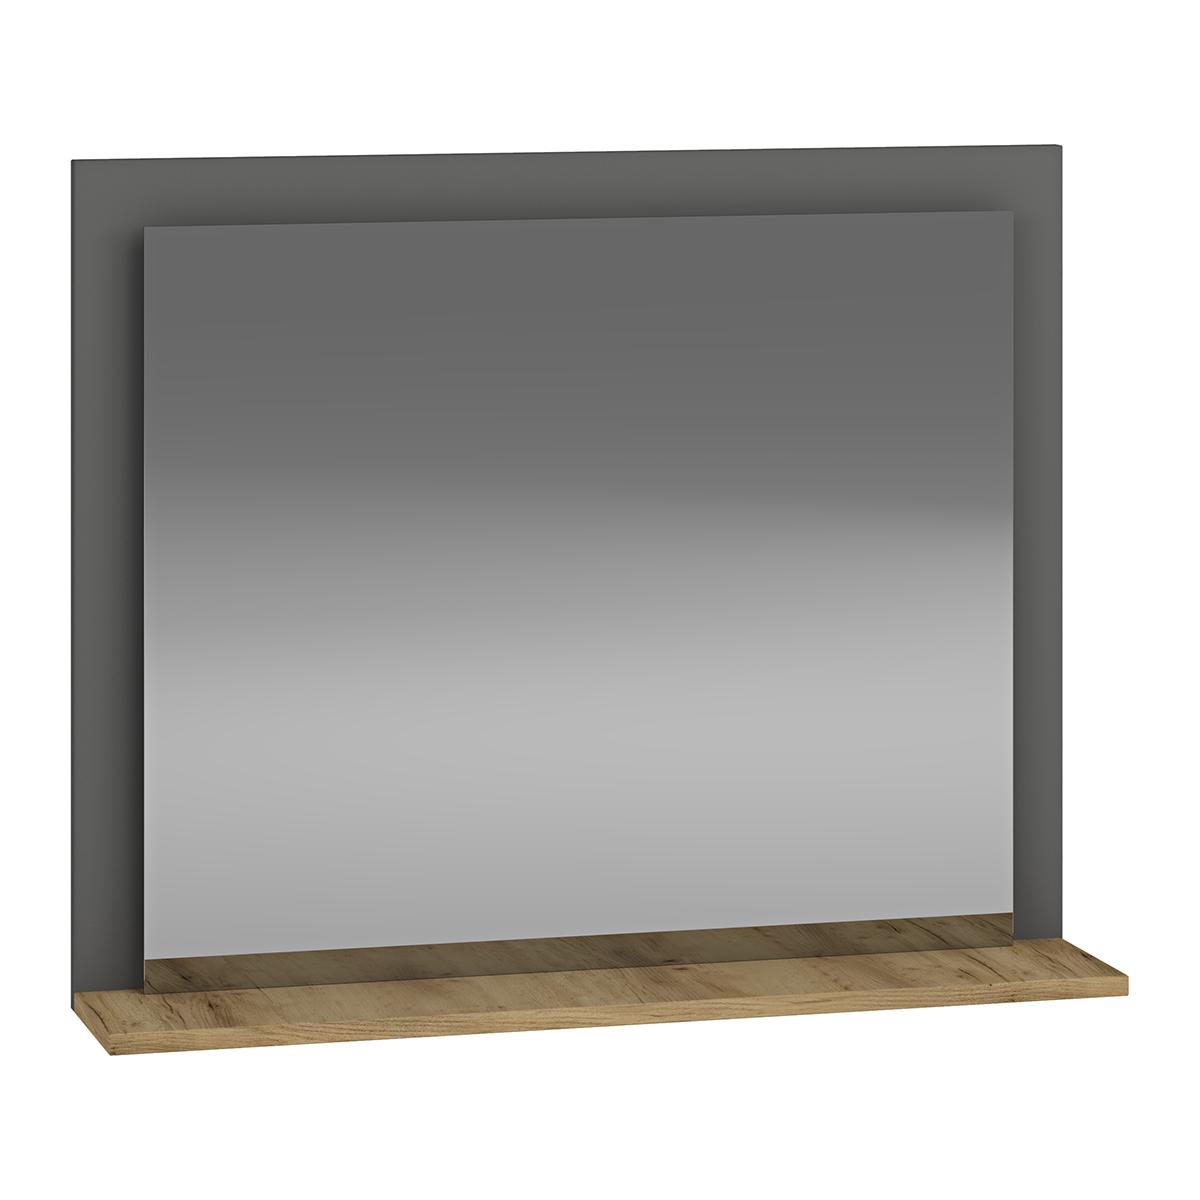 NABBI Baleta Z80 zrkadlo na stenu antracit / craft zlatý